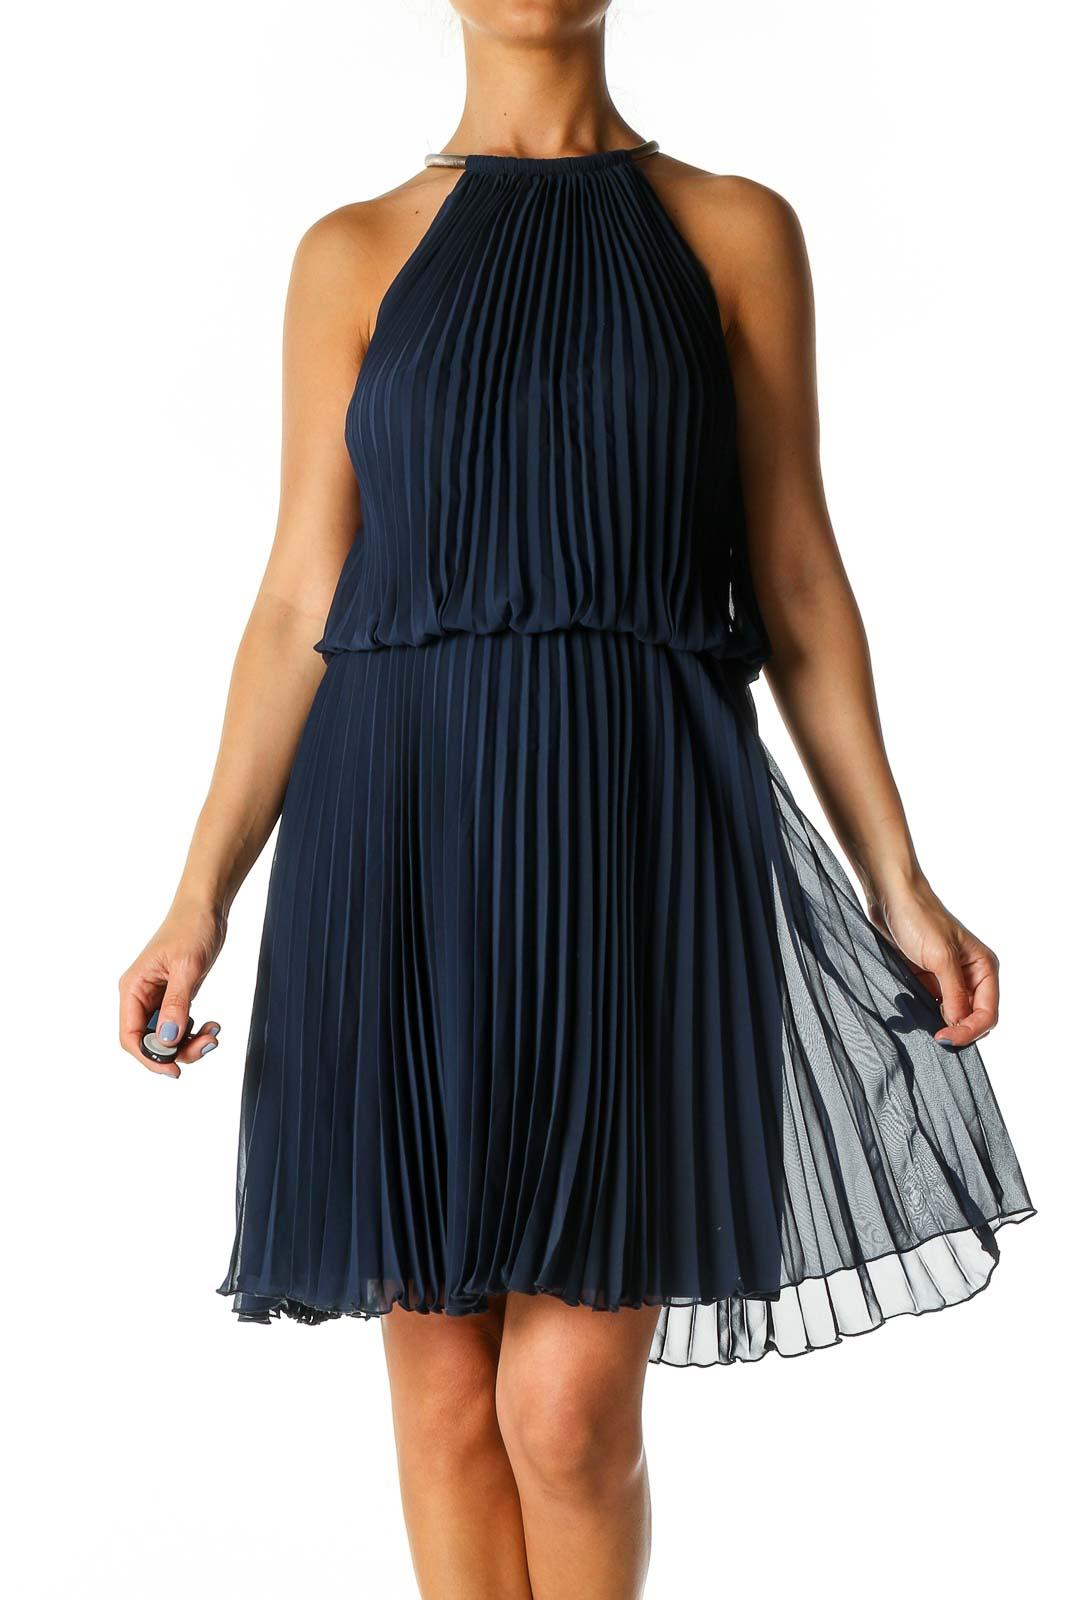 Blue Solid Cocktail A-Line Dress Front